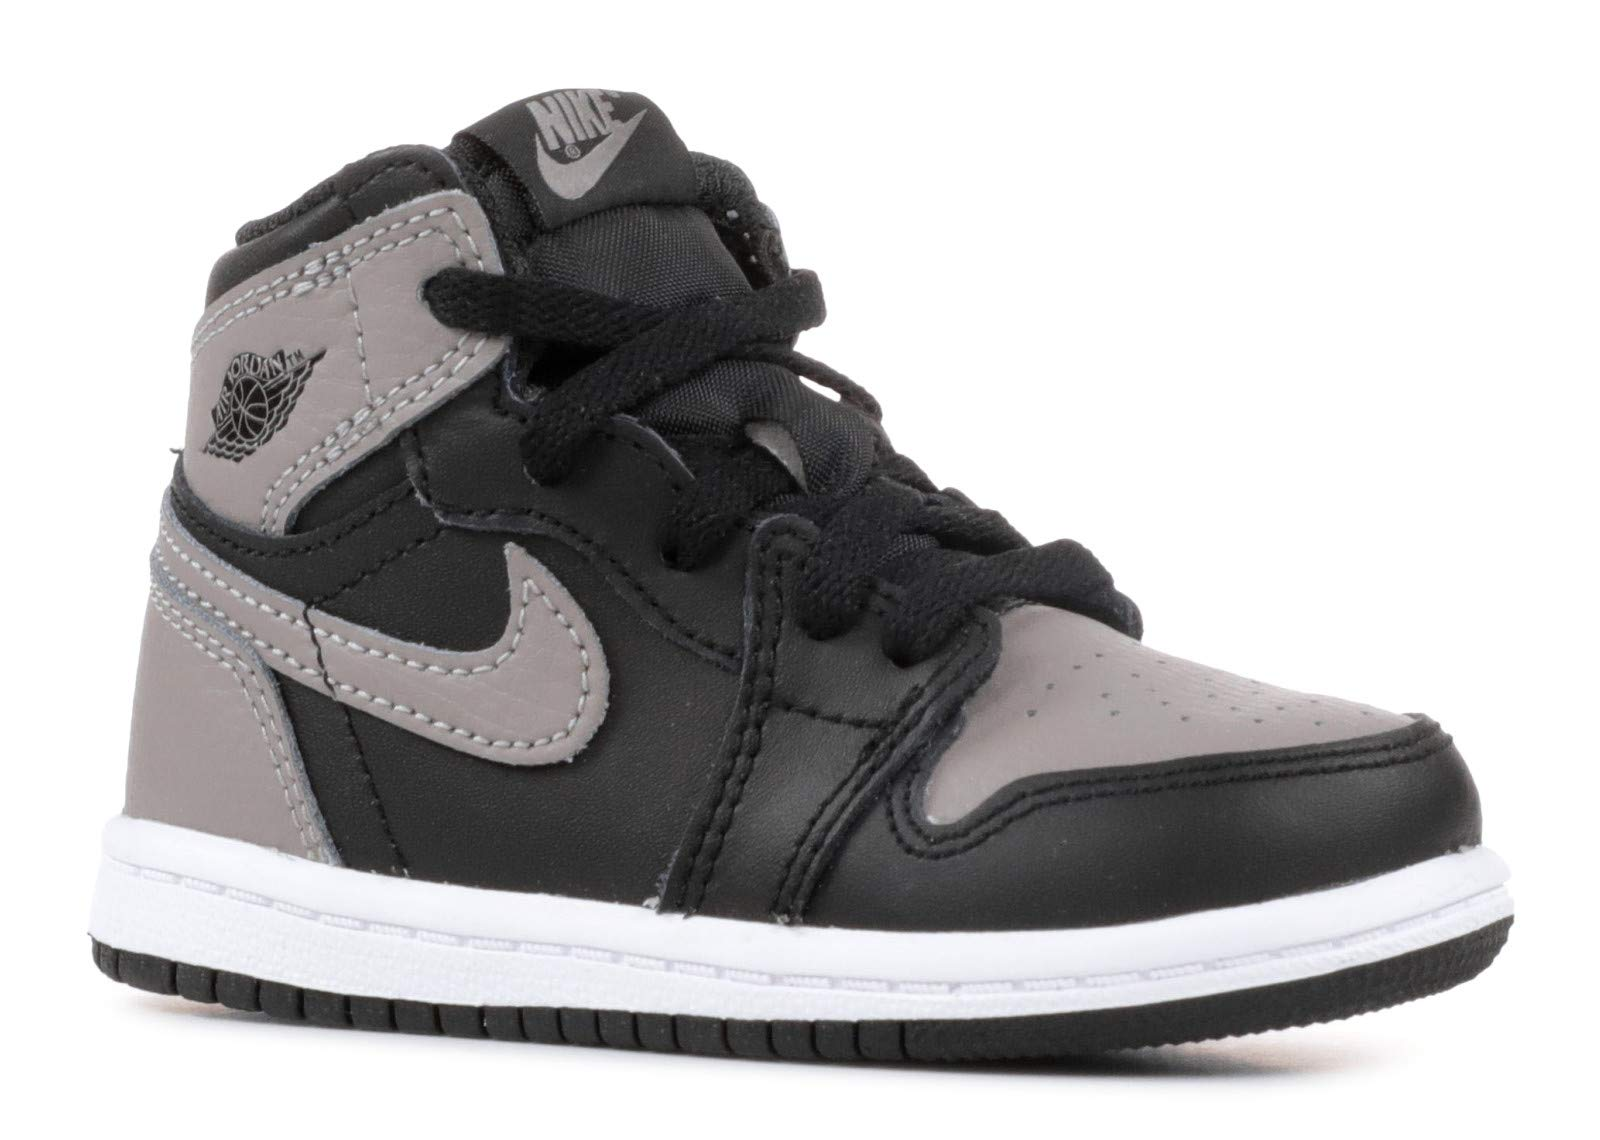 NIKE Jordan 1 Retro High OG Toddler's Shoes Black/Medium Grey/White aq2665-013 (8 M US)